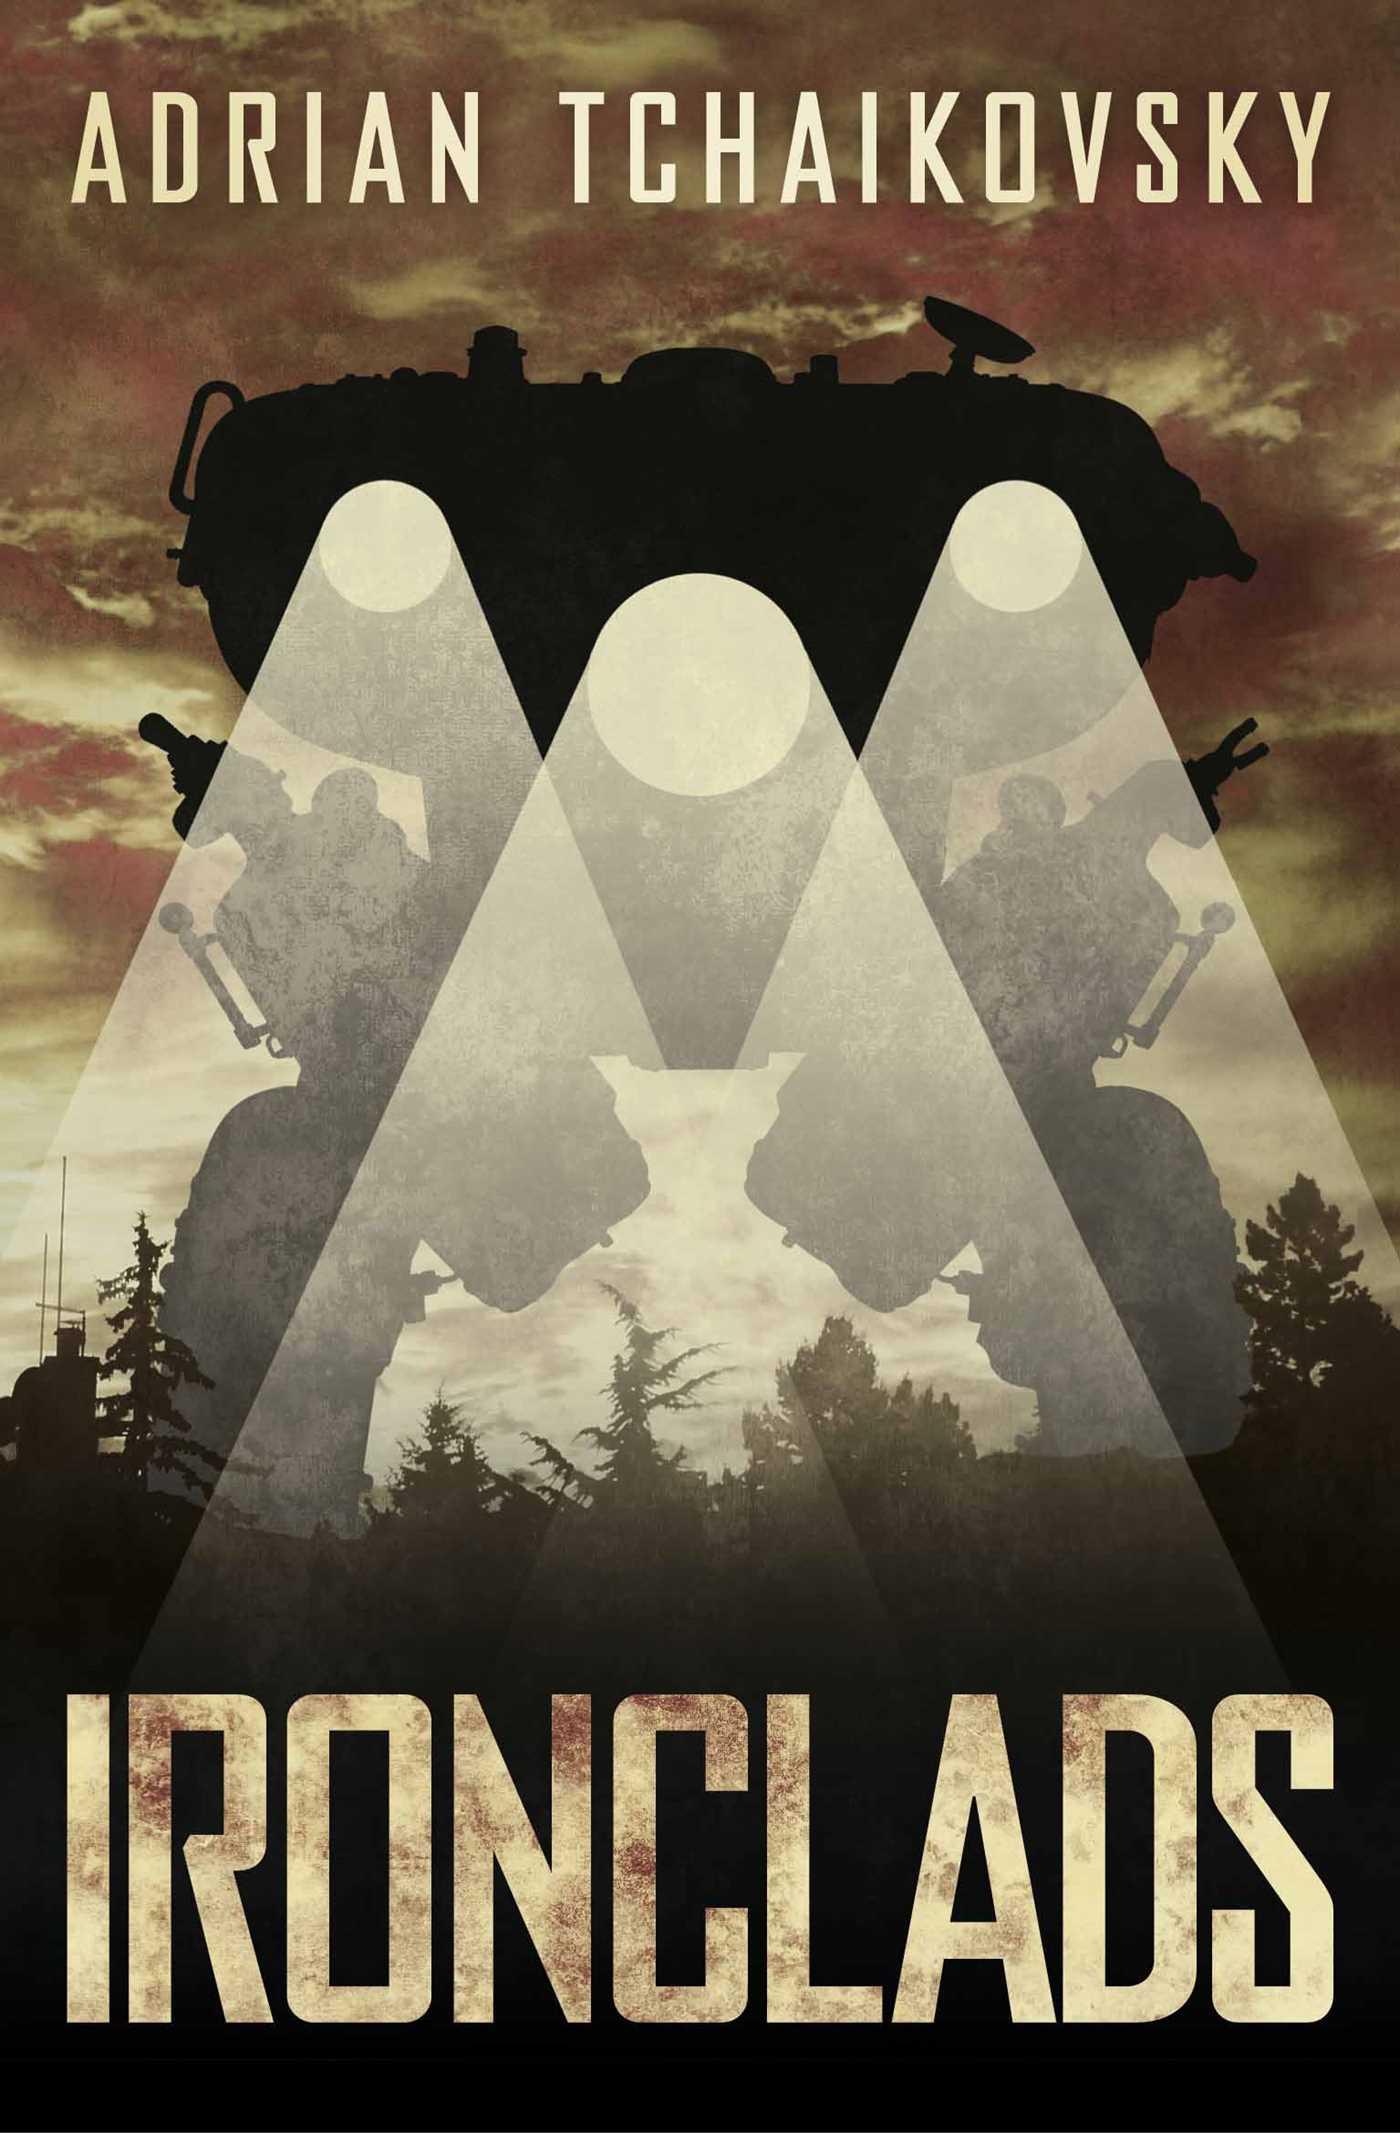 Ironclads 9781781085684 hr